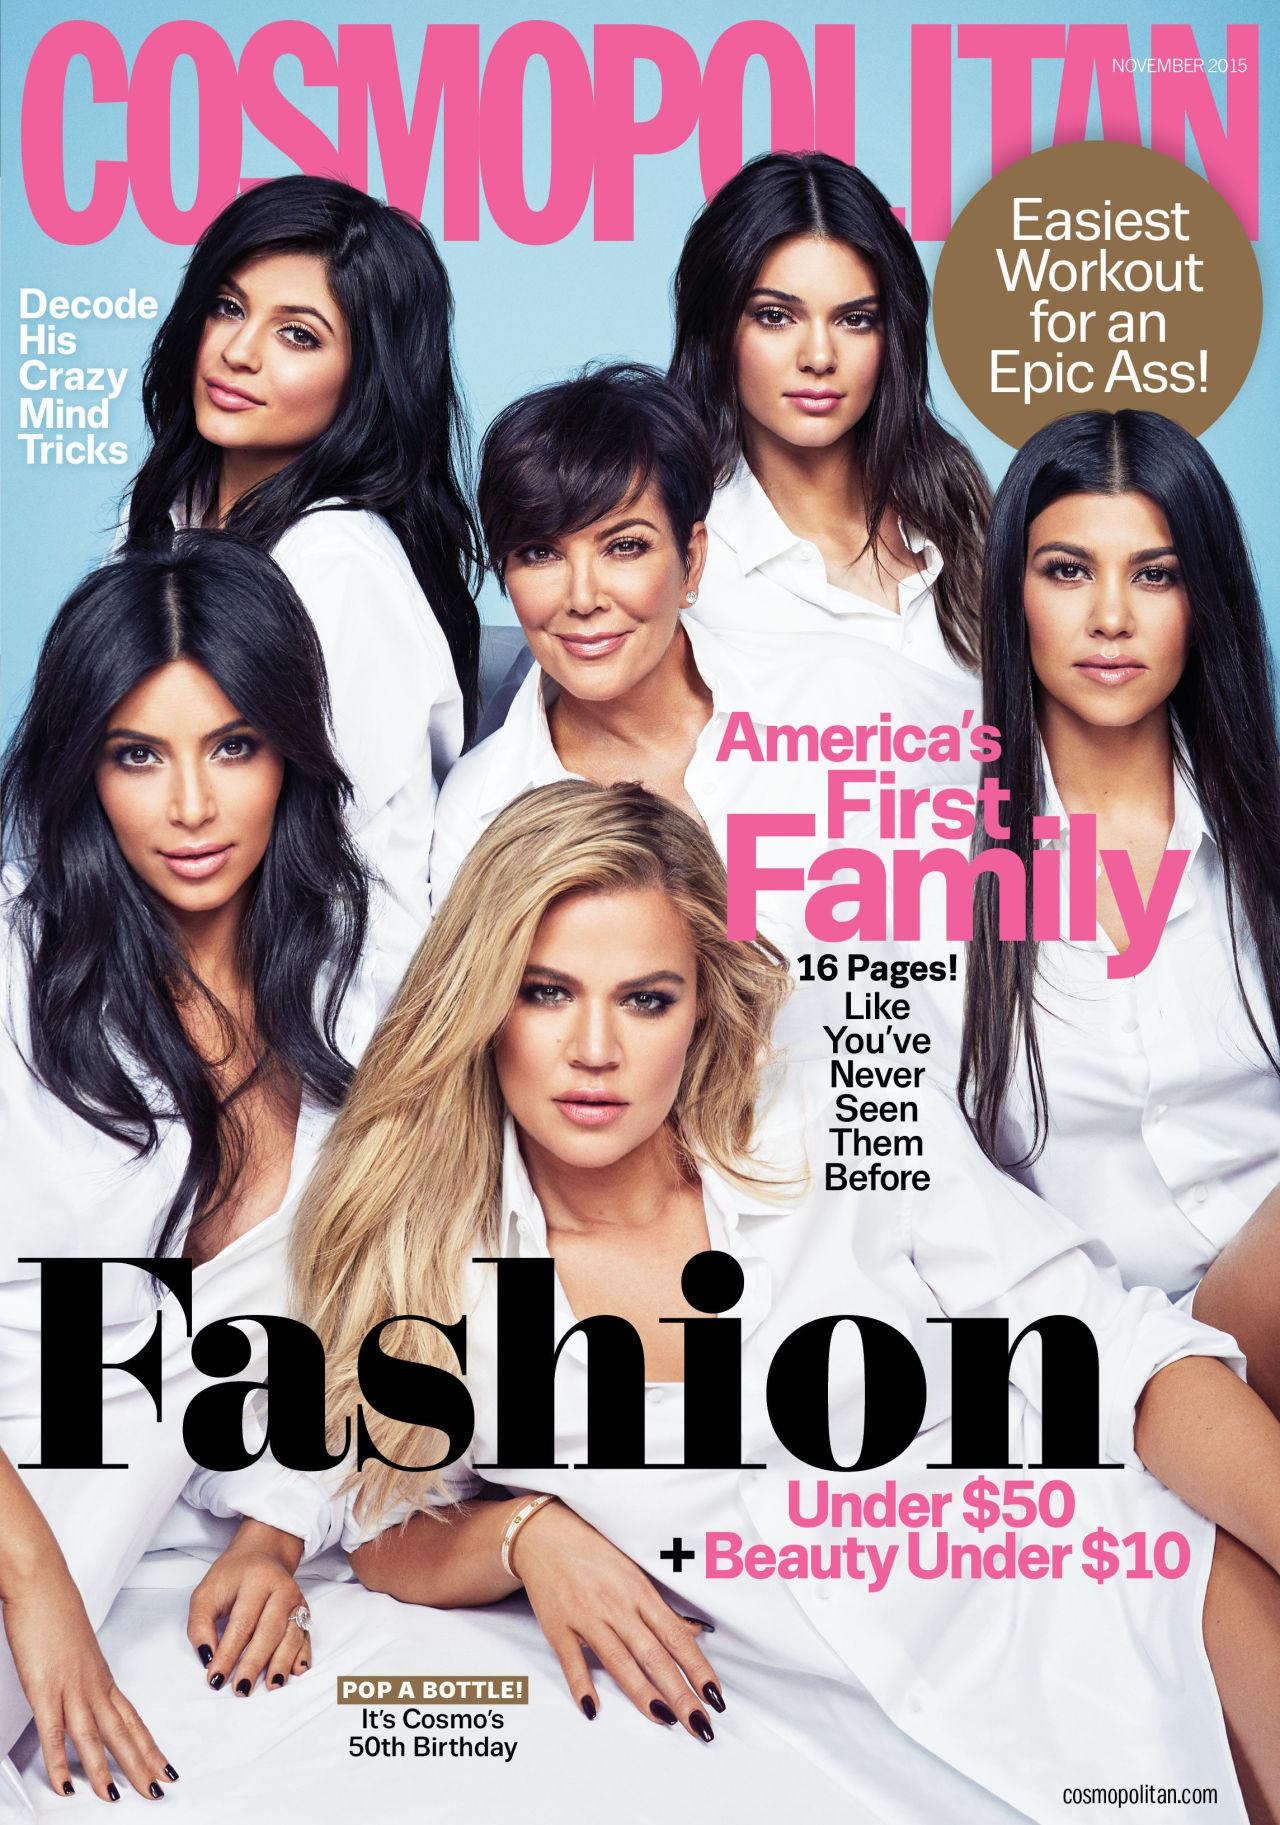 cosmopolitan-november-2015-newsstand